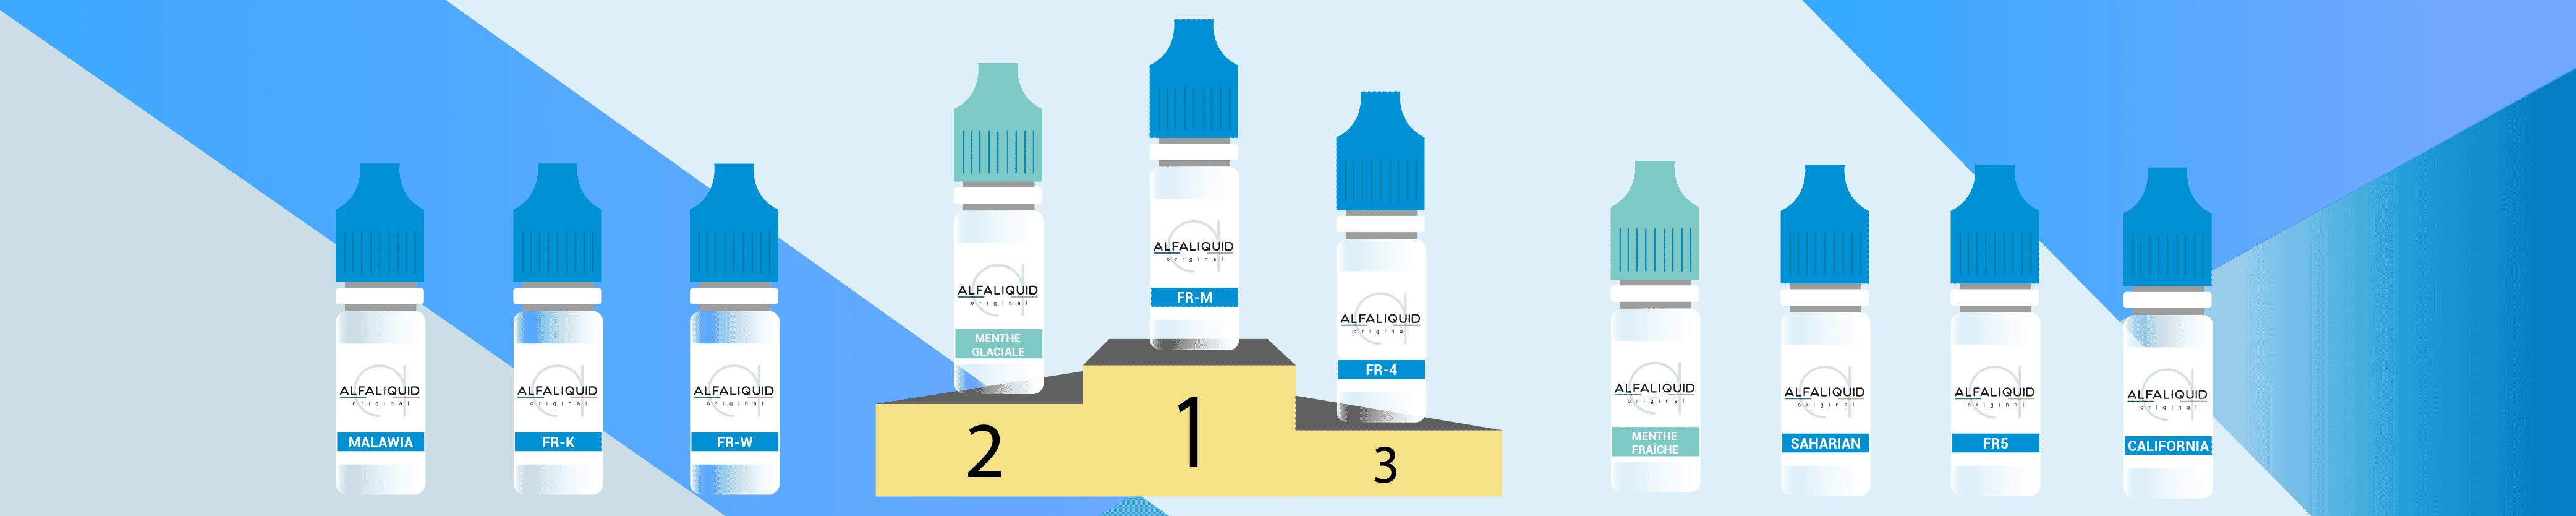 classement-eliquide-alfaliquid-2019.png